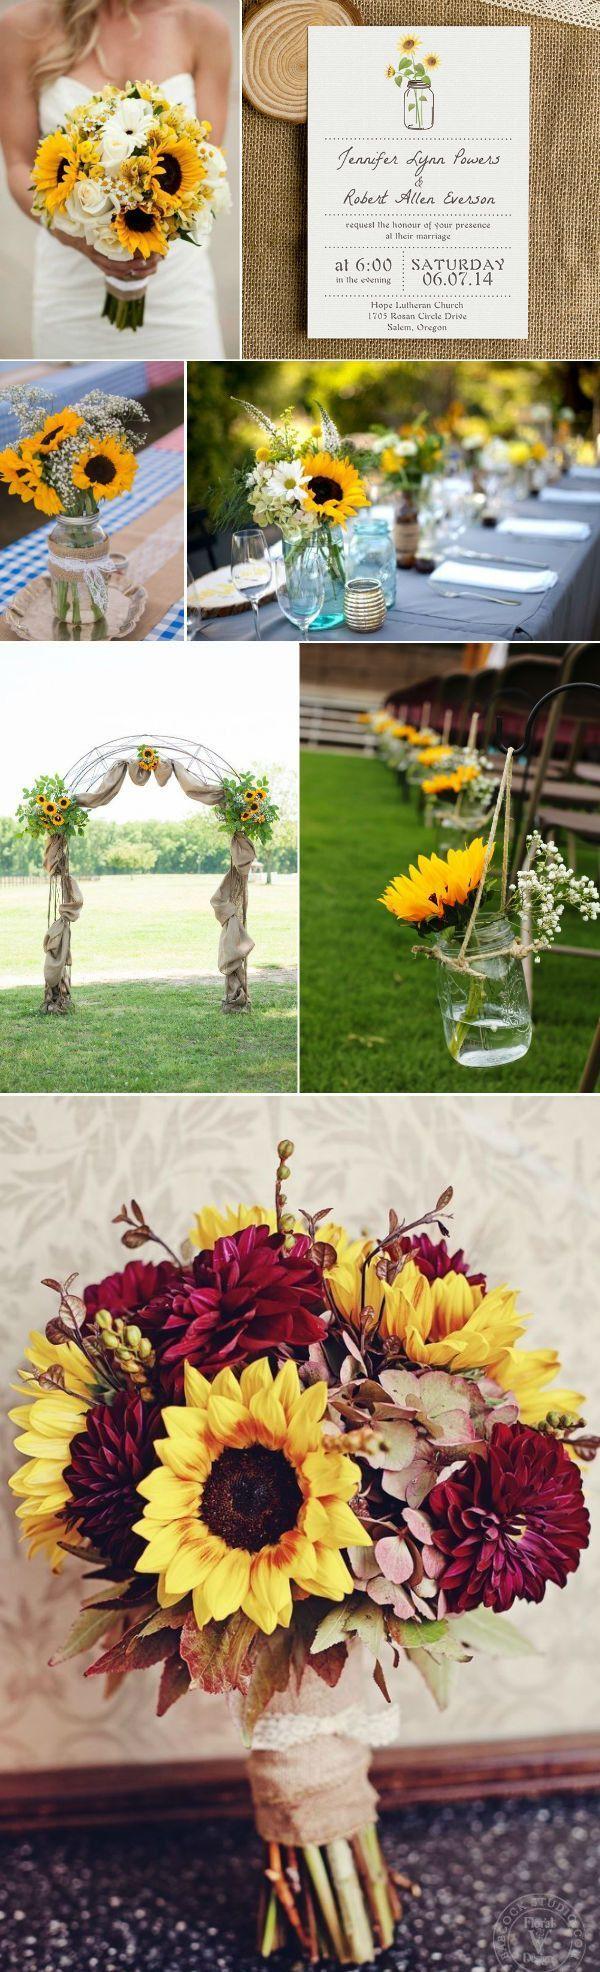 rustic fall sunflower and mason jar themed wedding ideas